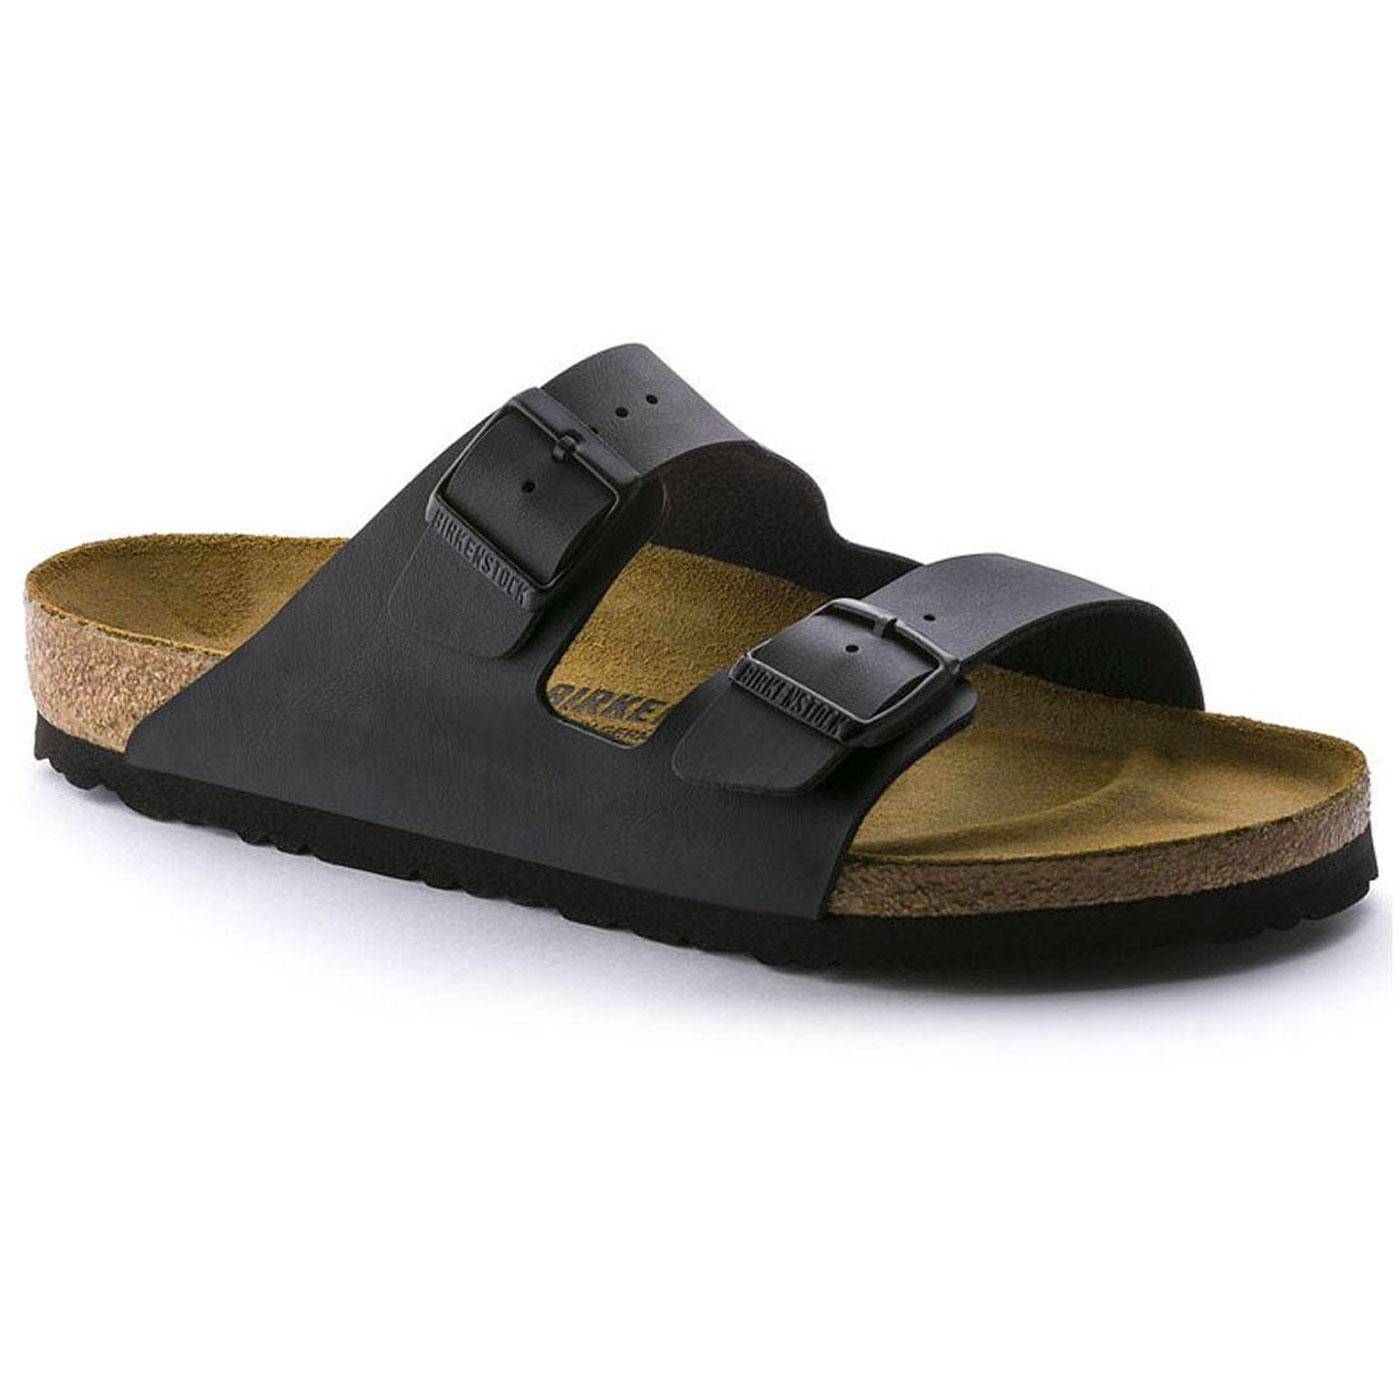 Arizona BIRKENSTOCK Mens Retro 2 Strap Sandals (B)